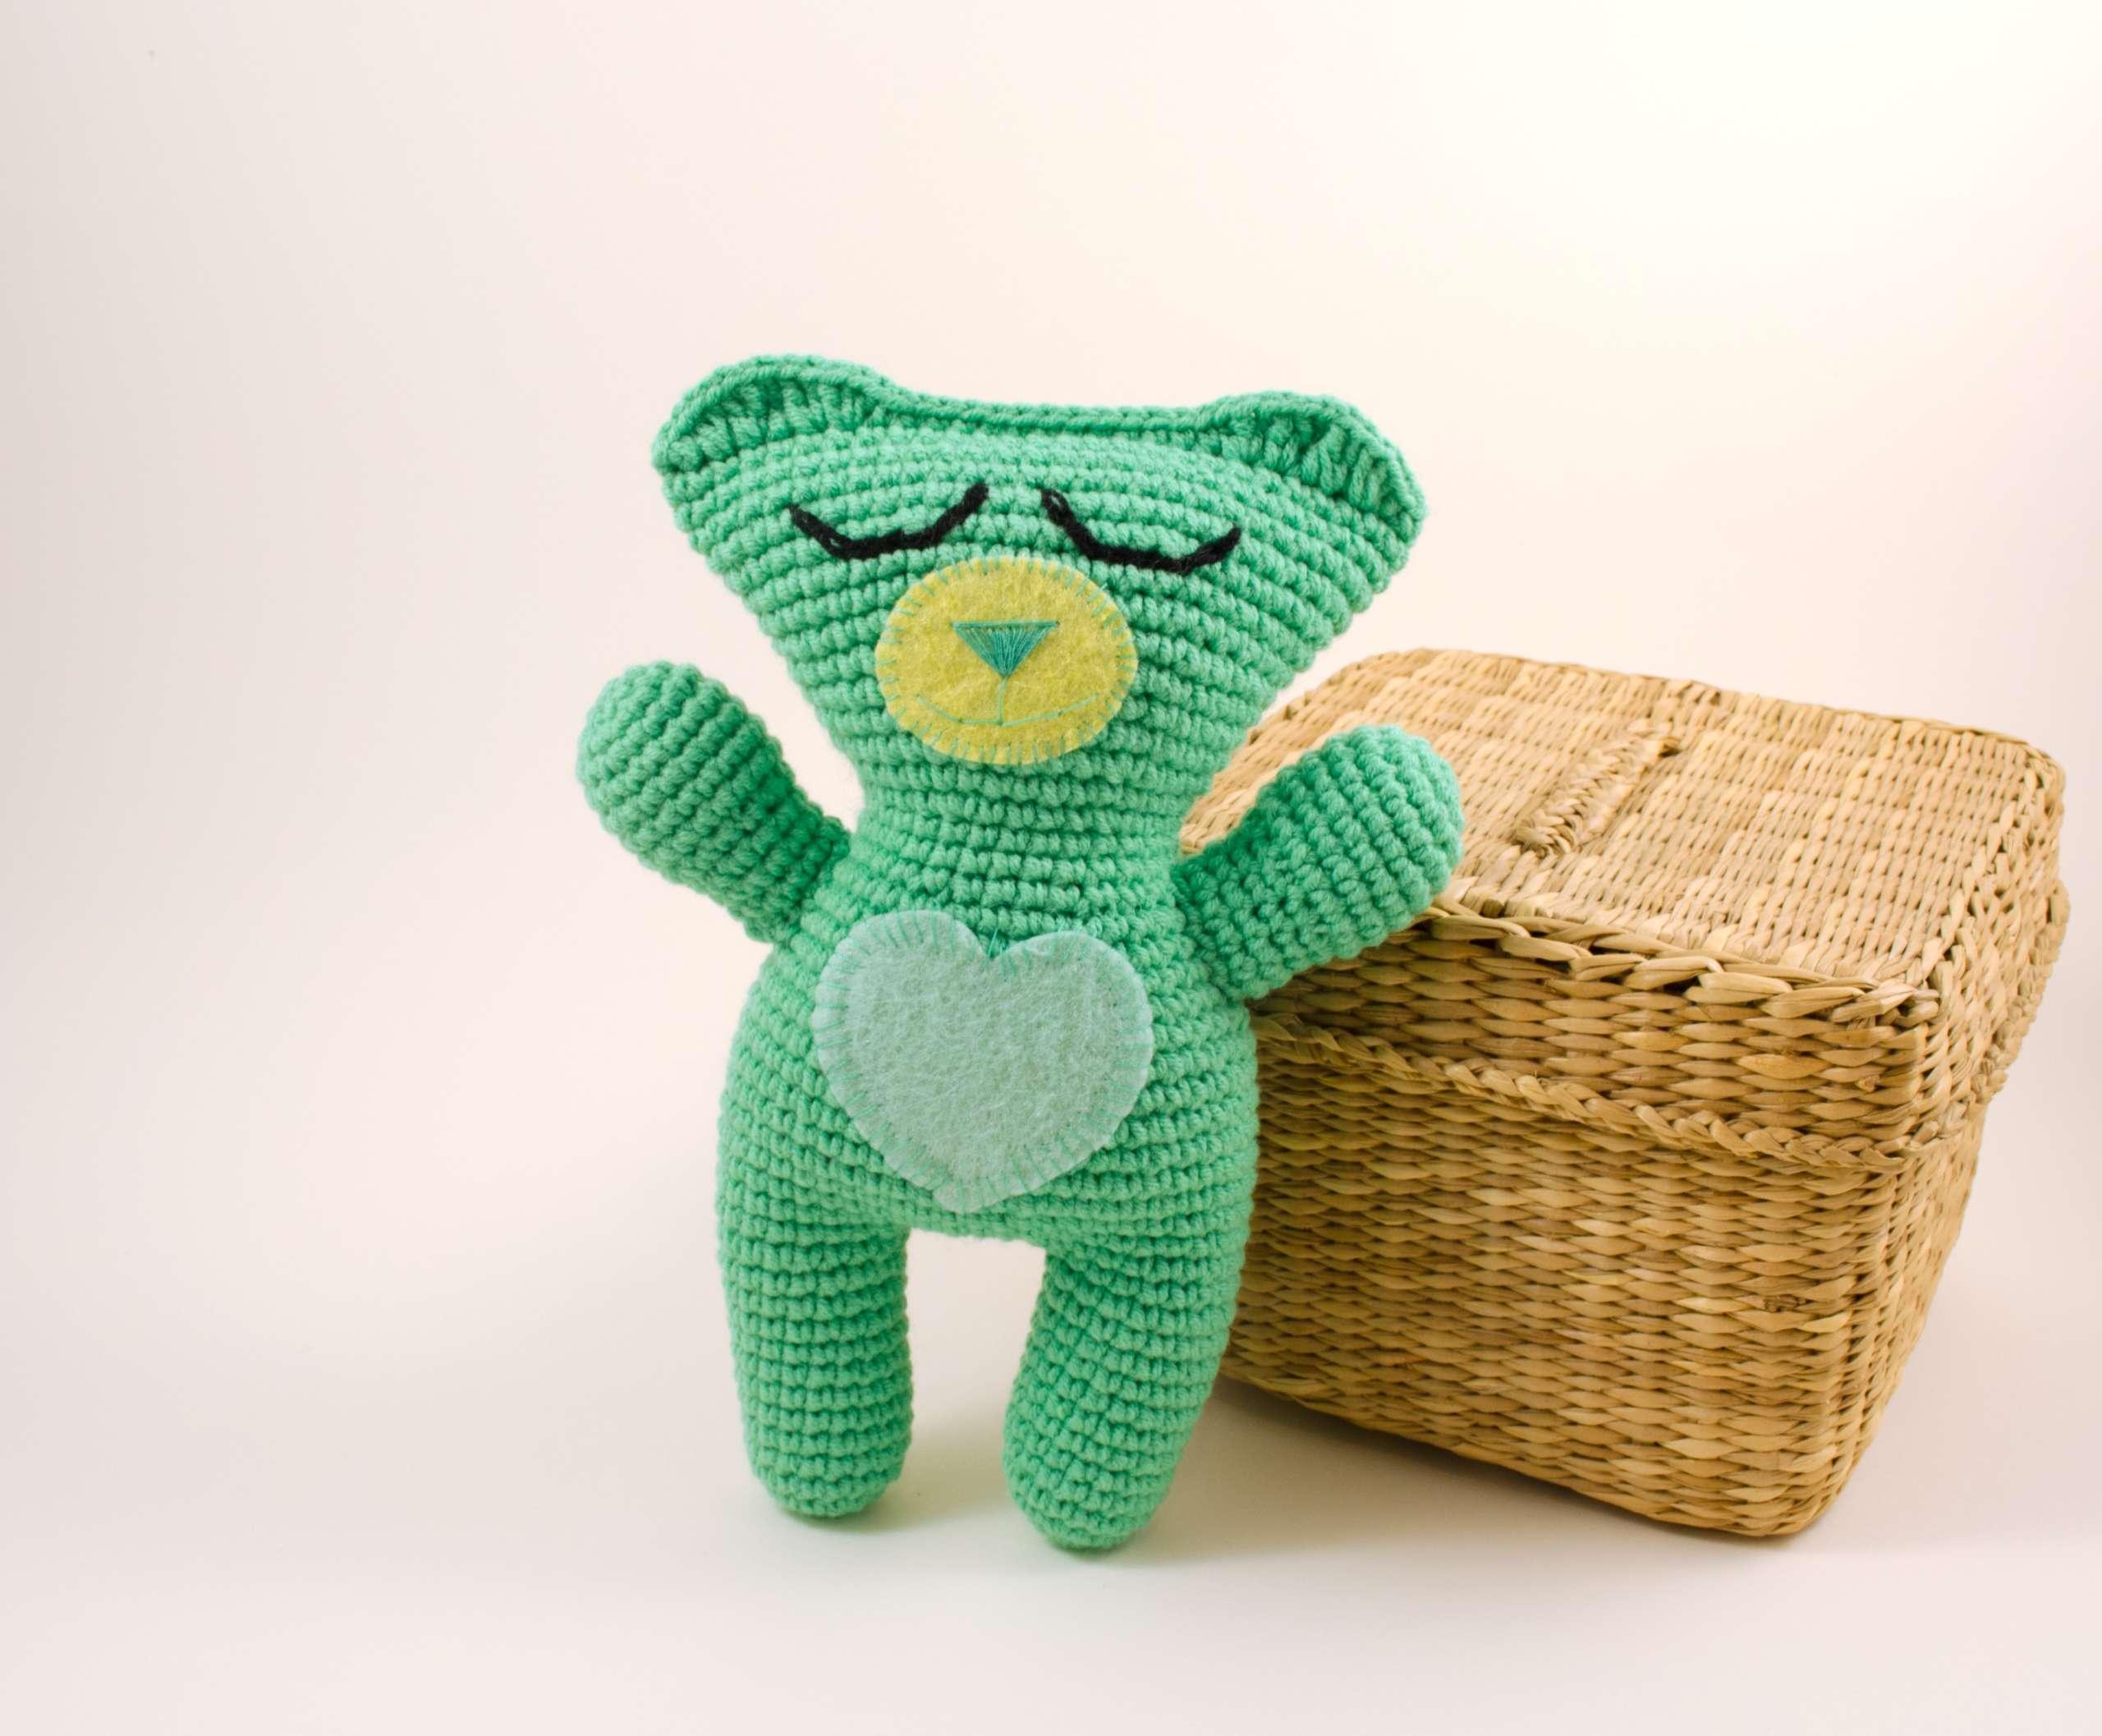 crochet teddy bear front view